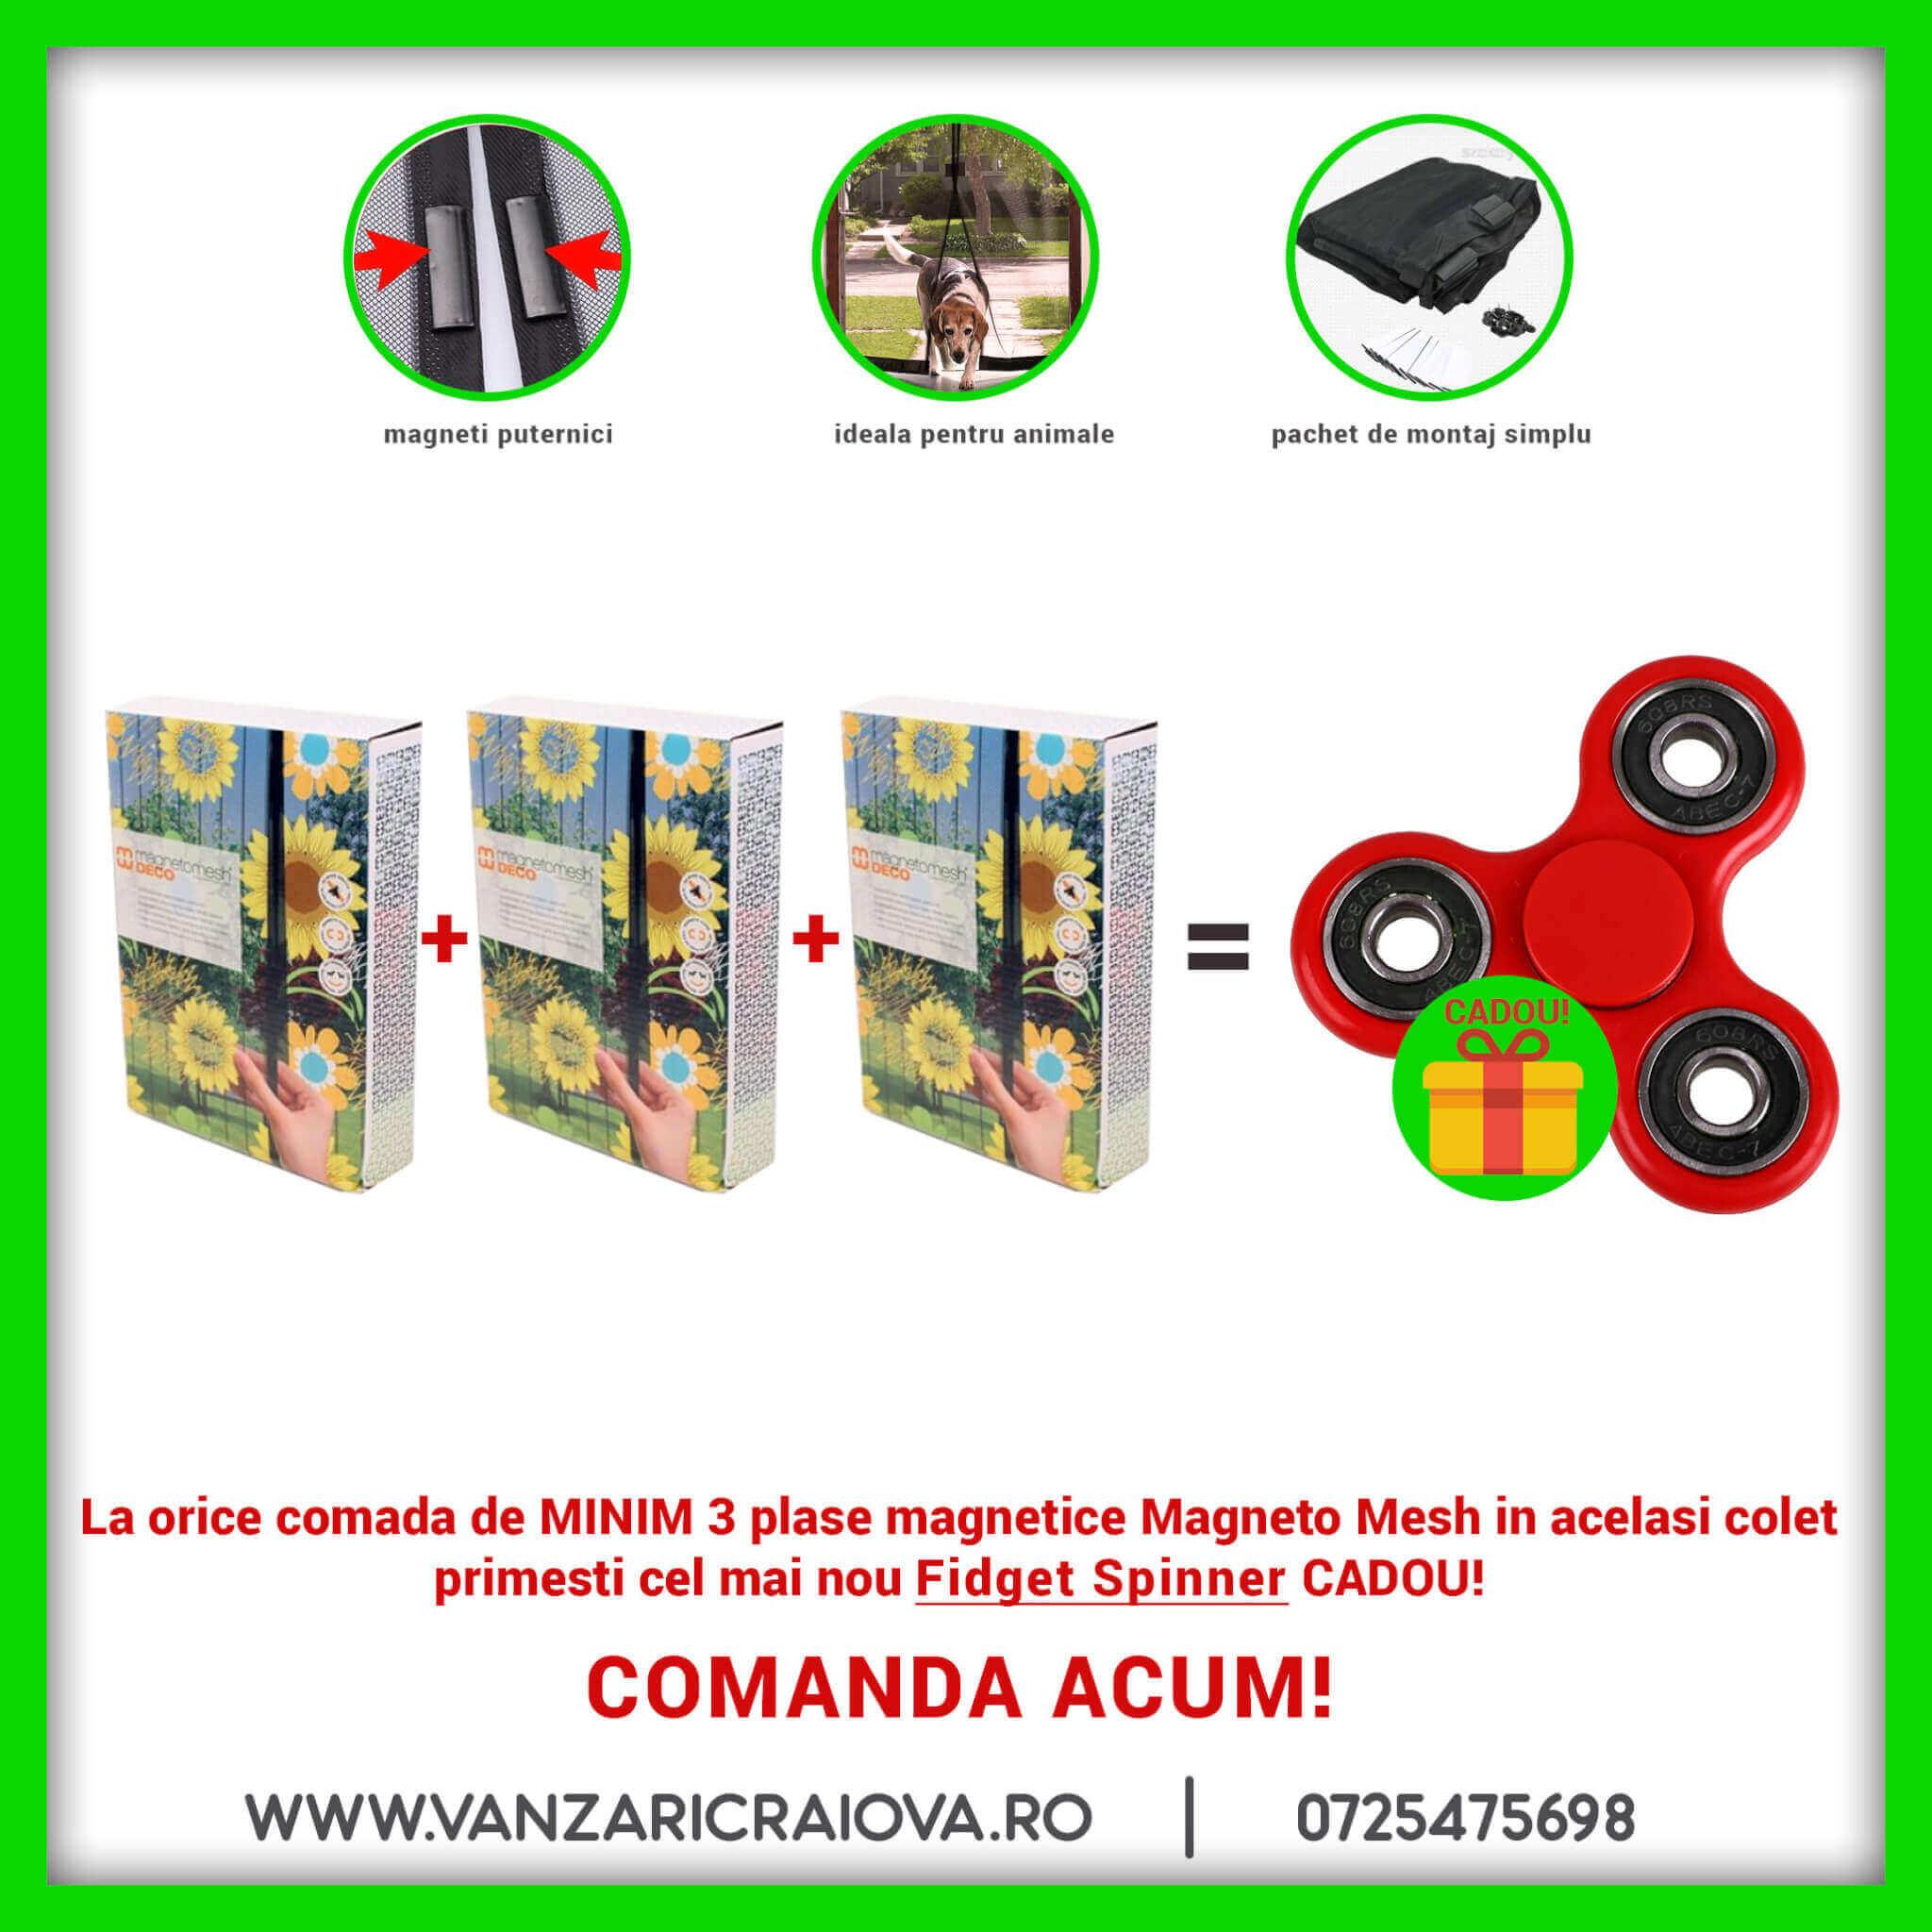 Comanzi 3 Plase Magnetice Usi si Castigi Automat